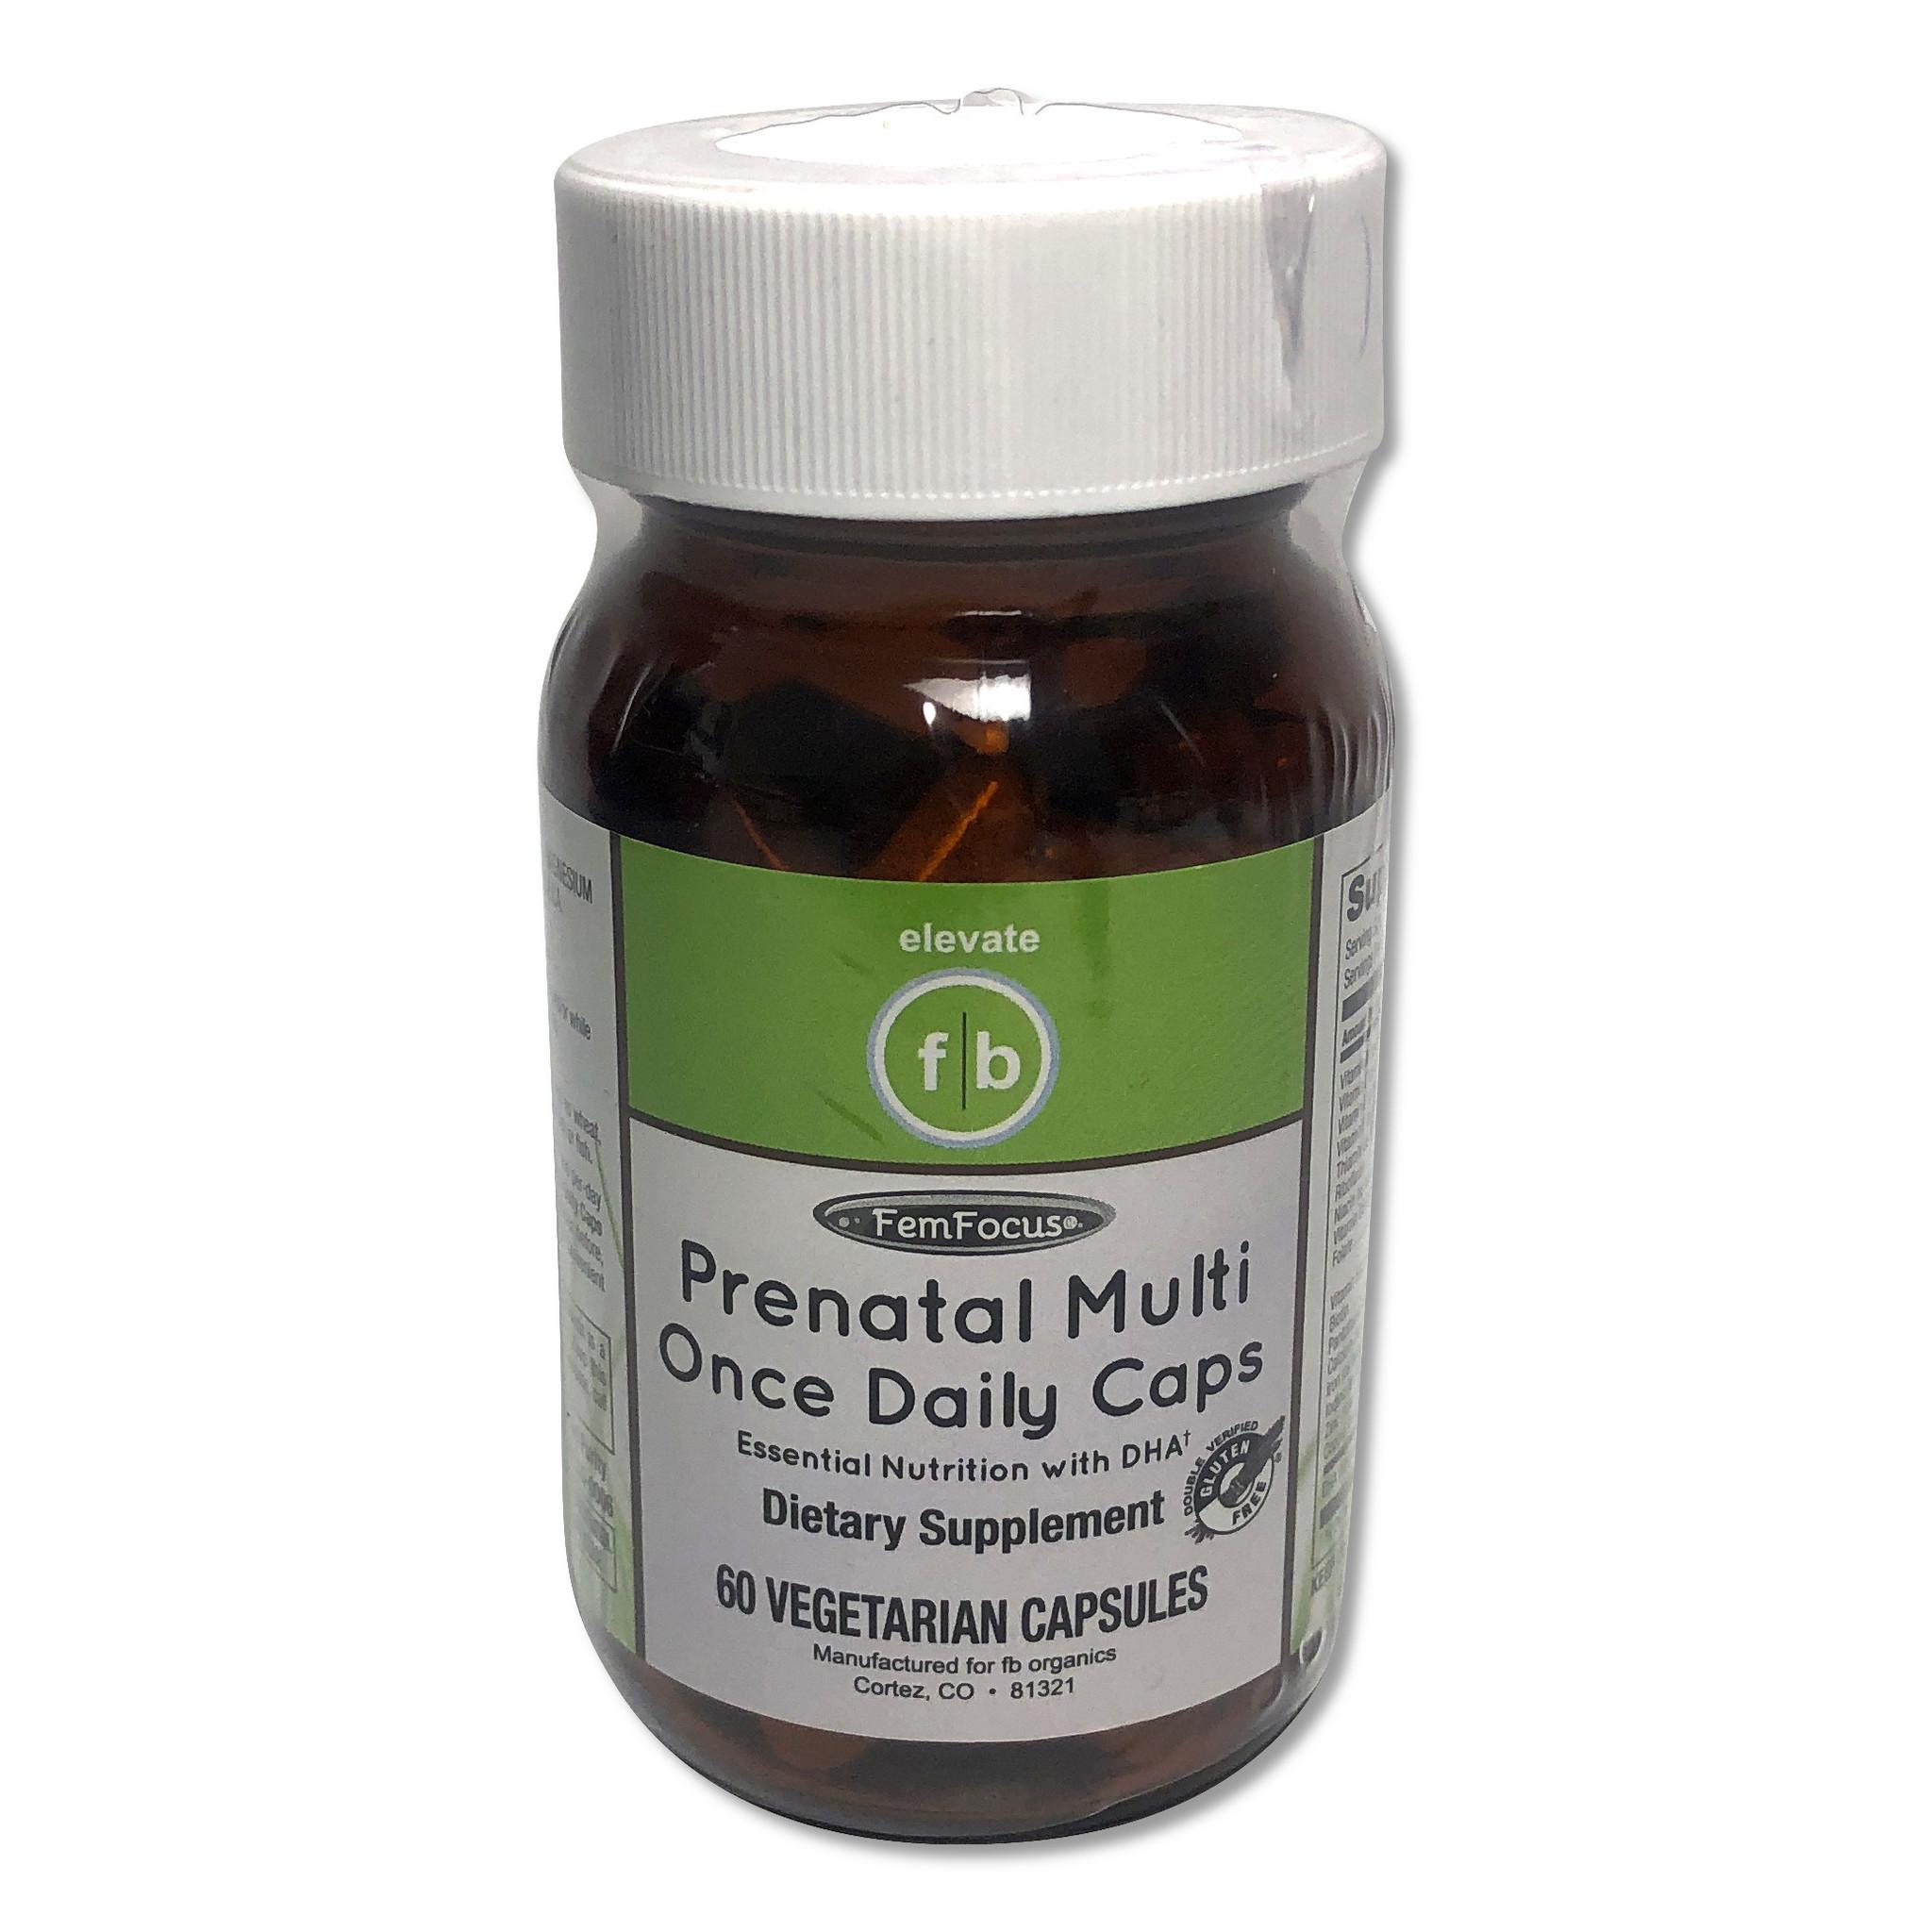 Prenatal Multi Once Daily Caps 60CT-1